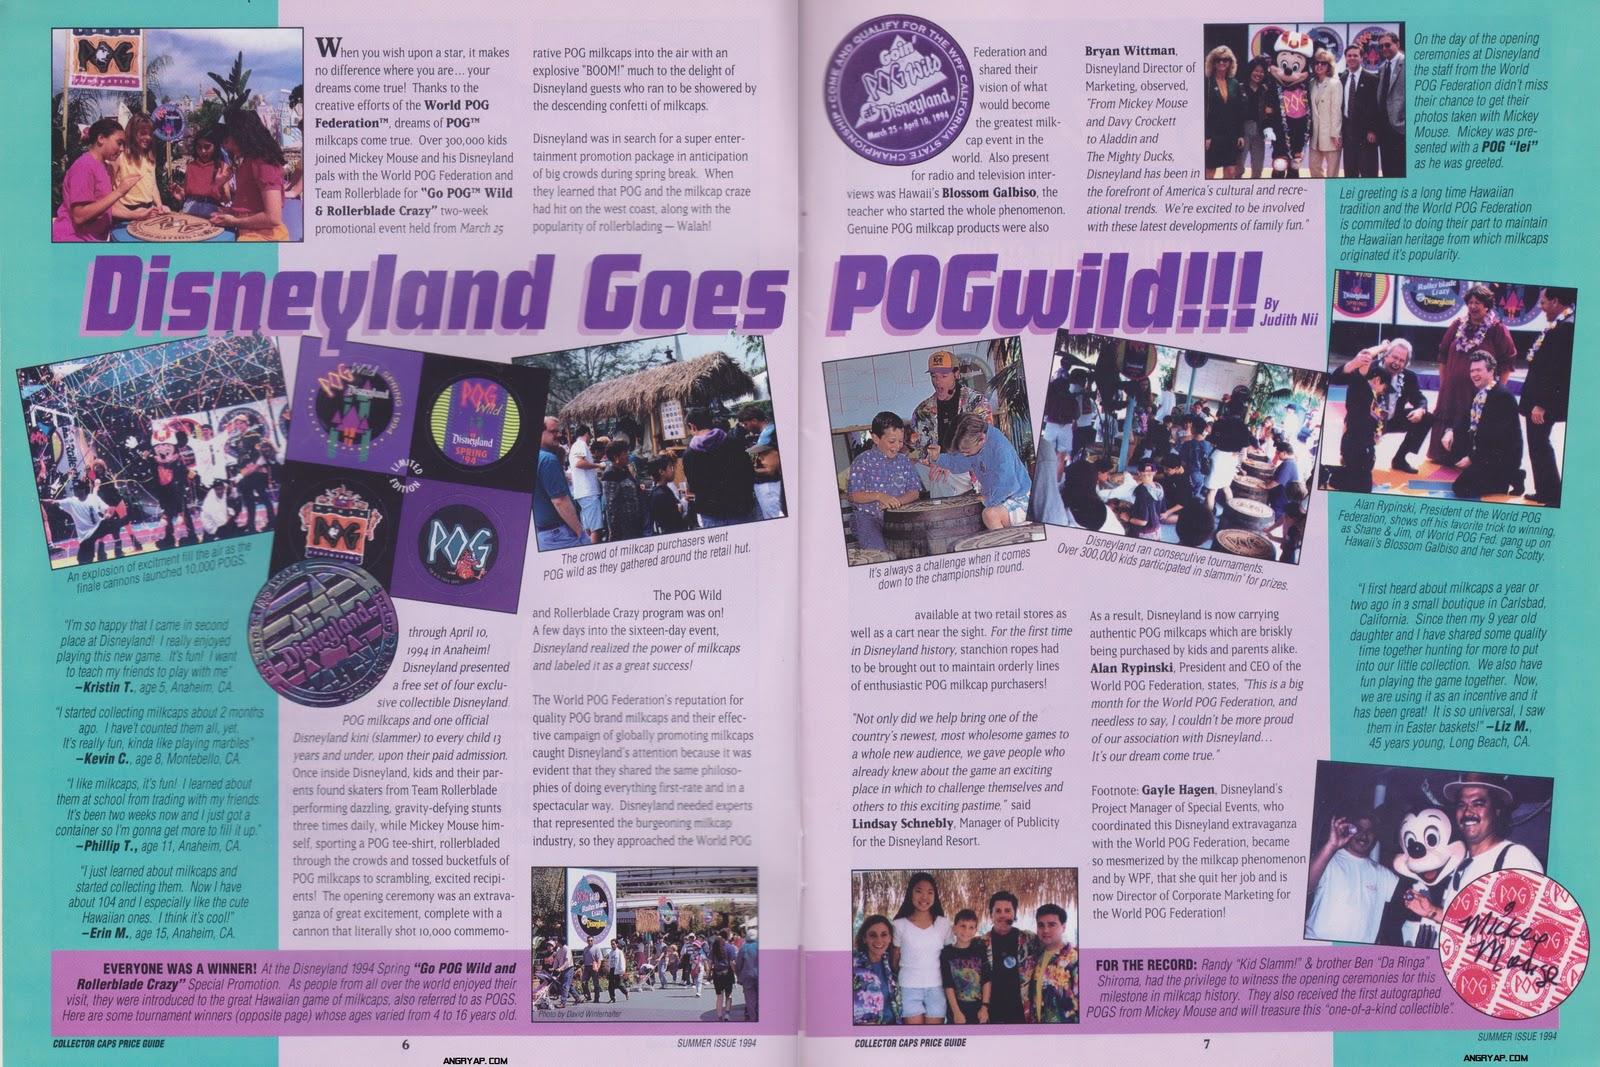 Angry AP - Disneyland and Walt Disney World nostalgia